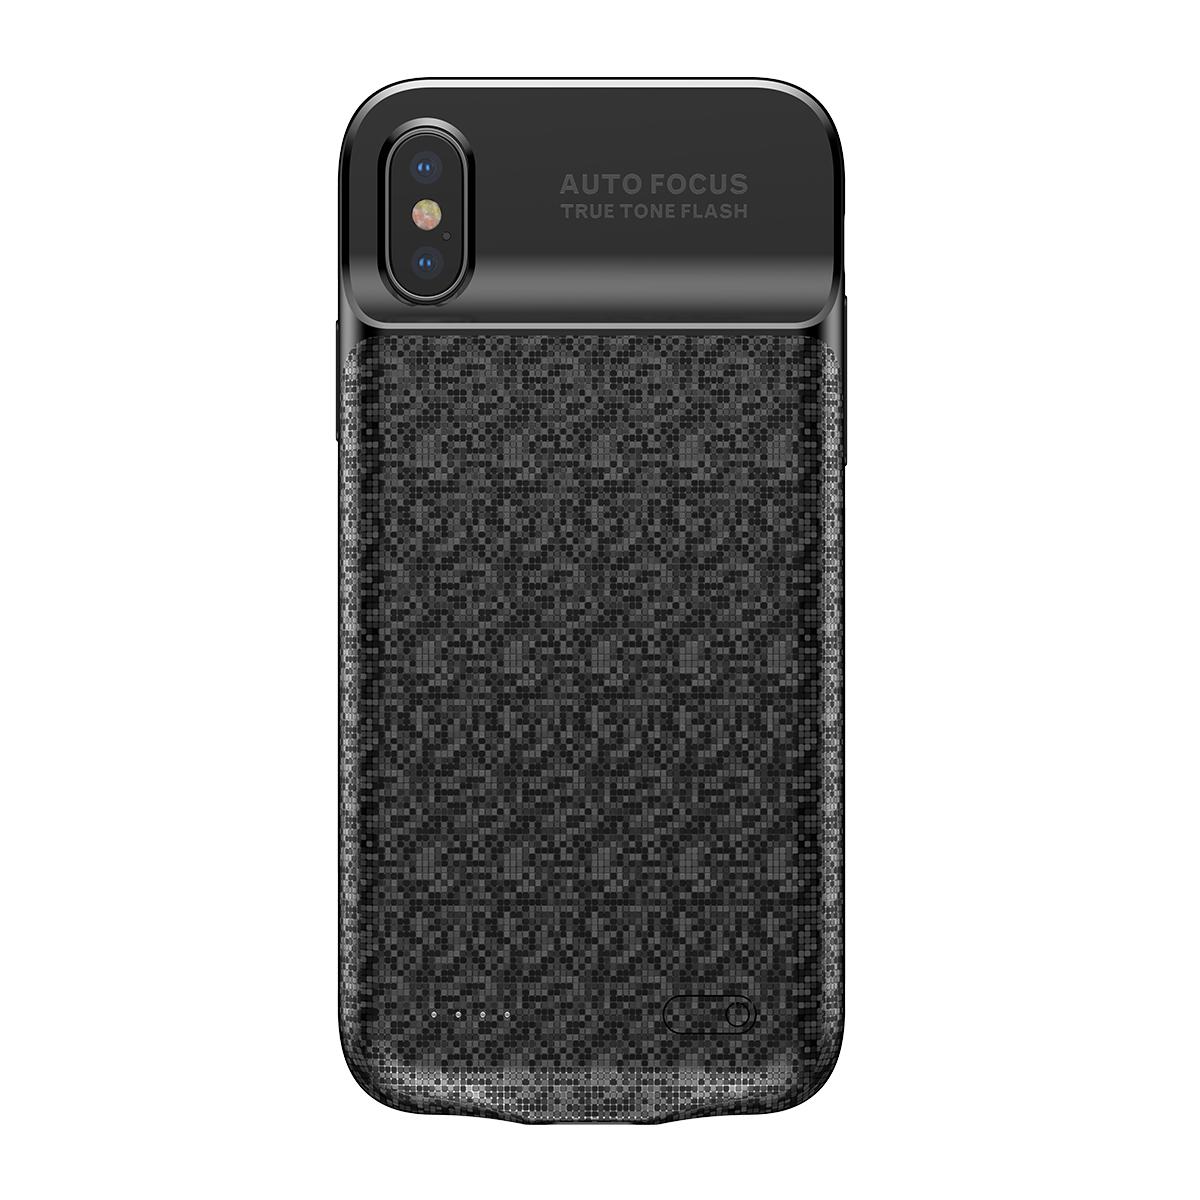 Аккумулятор чехол Baseus Plaid Backpack Power Bank Case 3500MAH для iPhoneX Черный